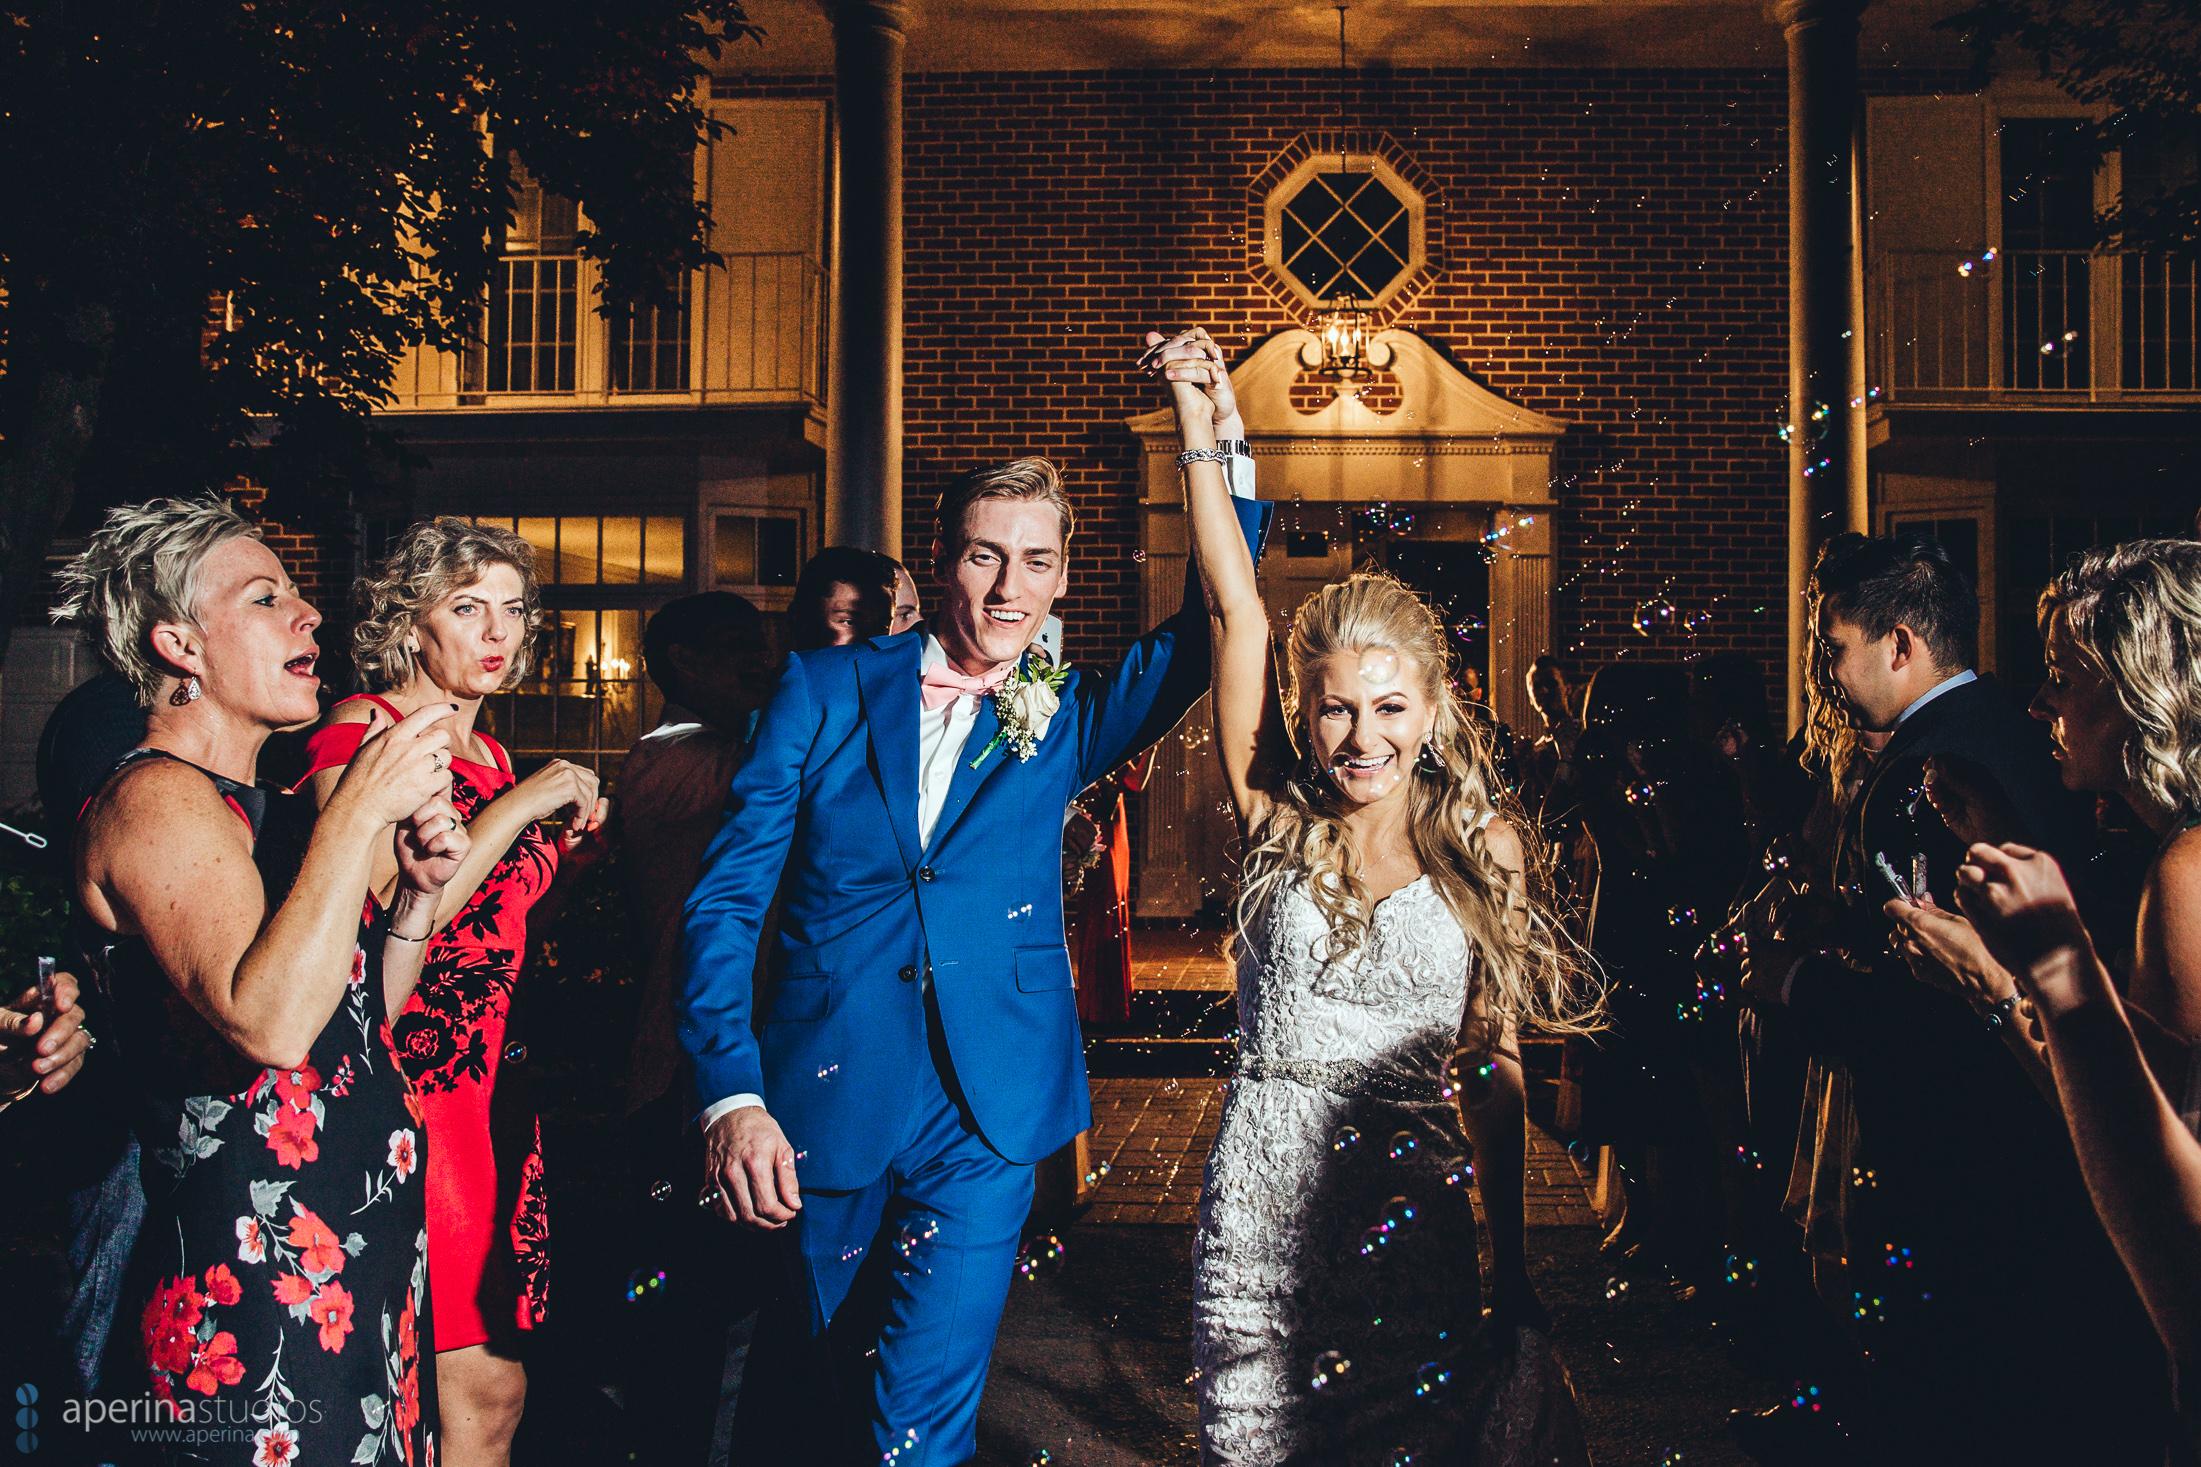 Grace Vineyards Winery Wedding Photos - Reception grand exit